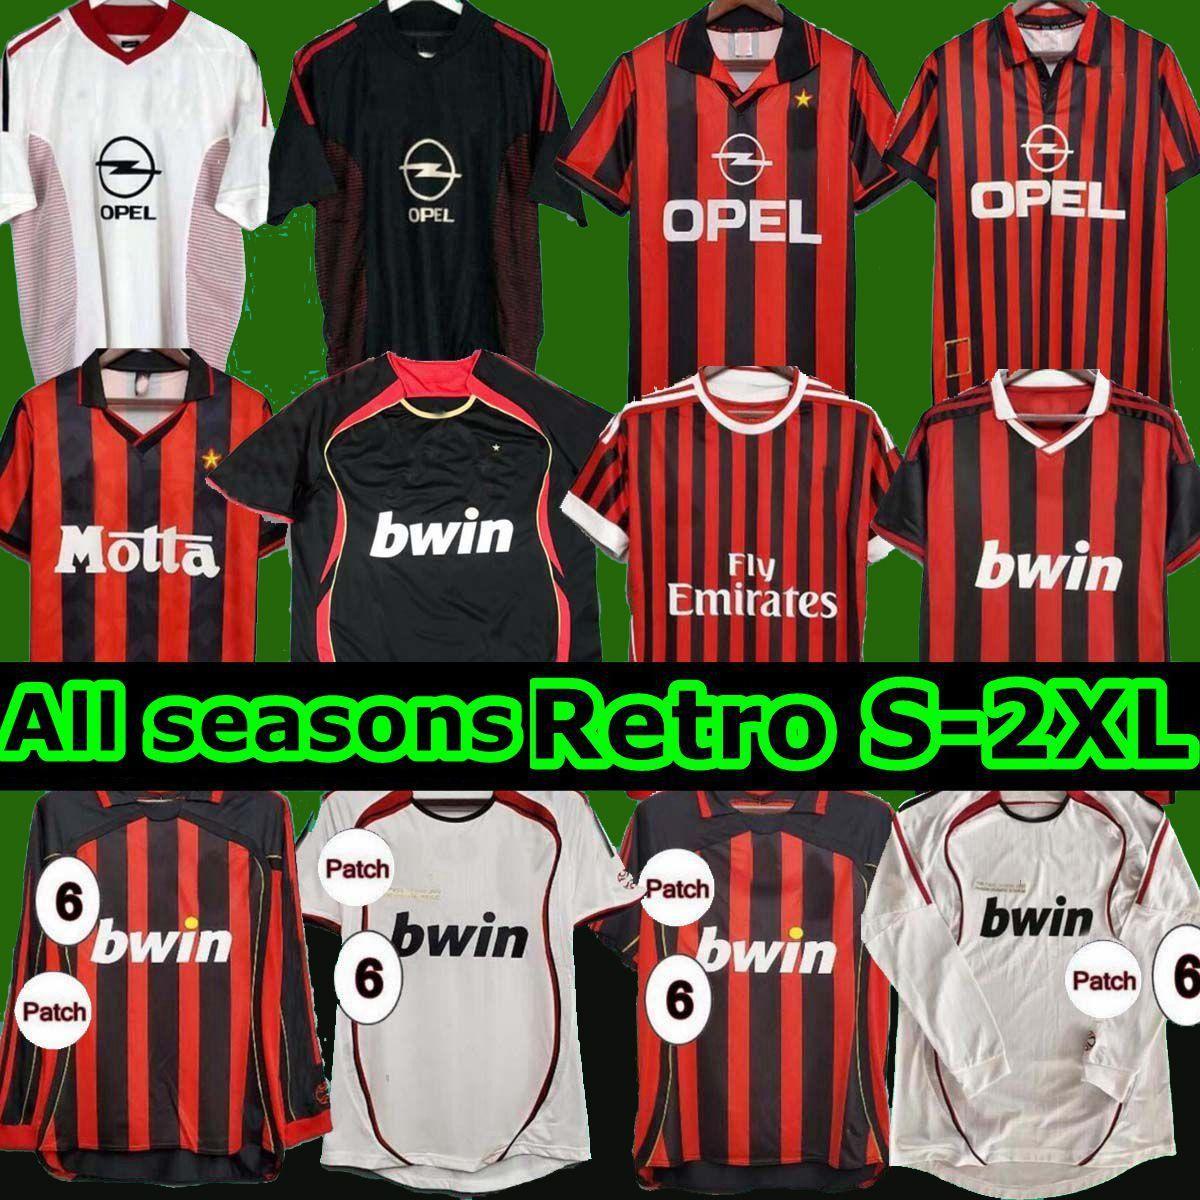 AC 2006 2007 Milán Fútbol Jersey 90 91 Camisetas retro Inicio 96 97 Gullit 02 03 04 Maldini Van Basten Football Ronaldo Kaka Inzaghi 09 10 Shevchenko Alta calidad